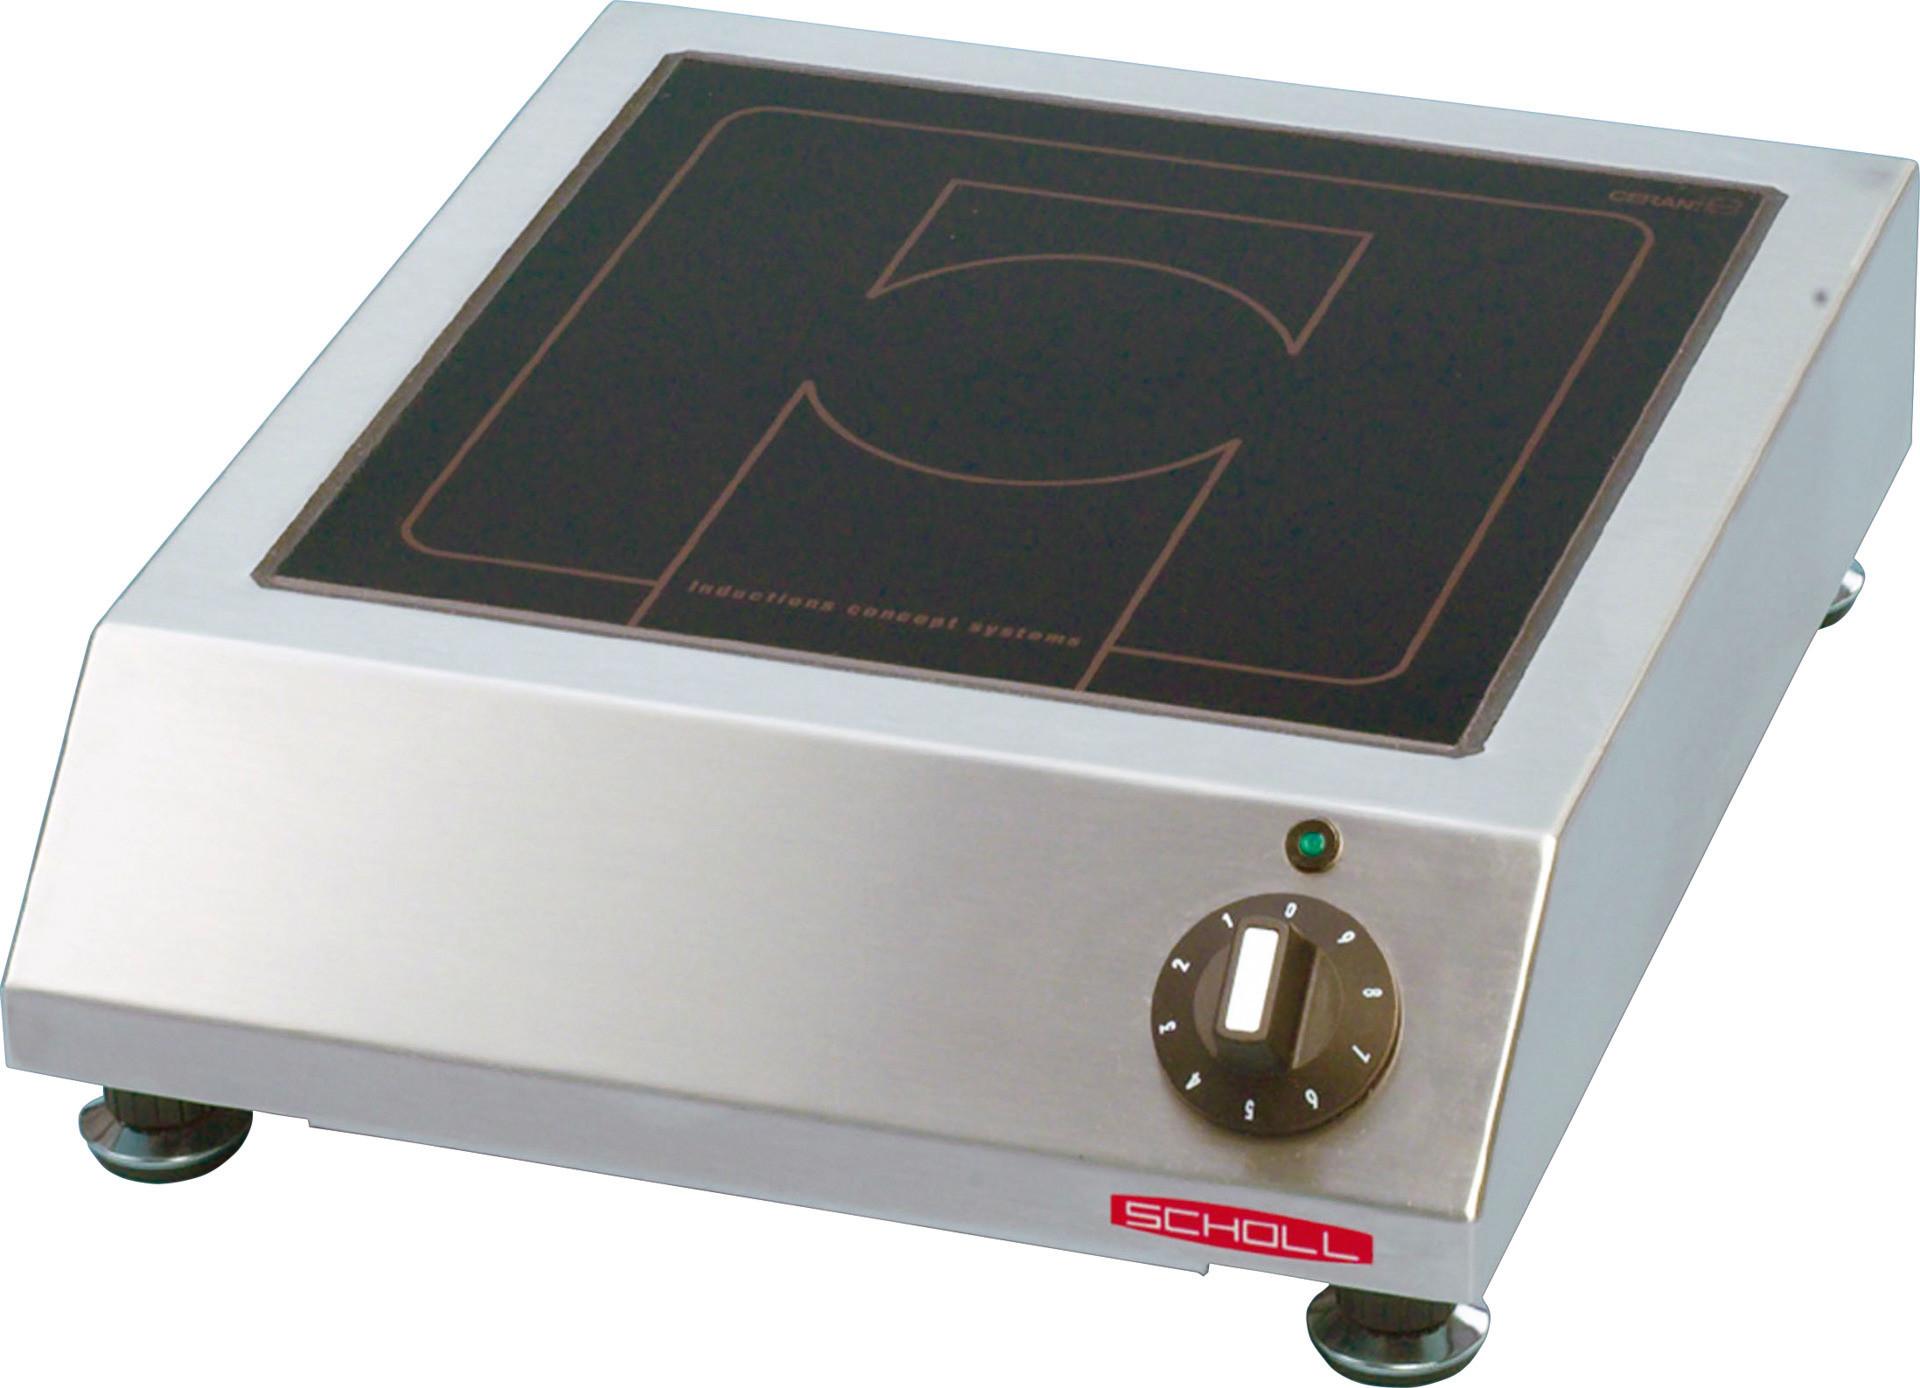 Induktions-Kochfeld 1 Heizzone / Feld 260 x 260 mm / Auftischgerät